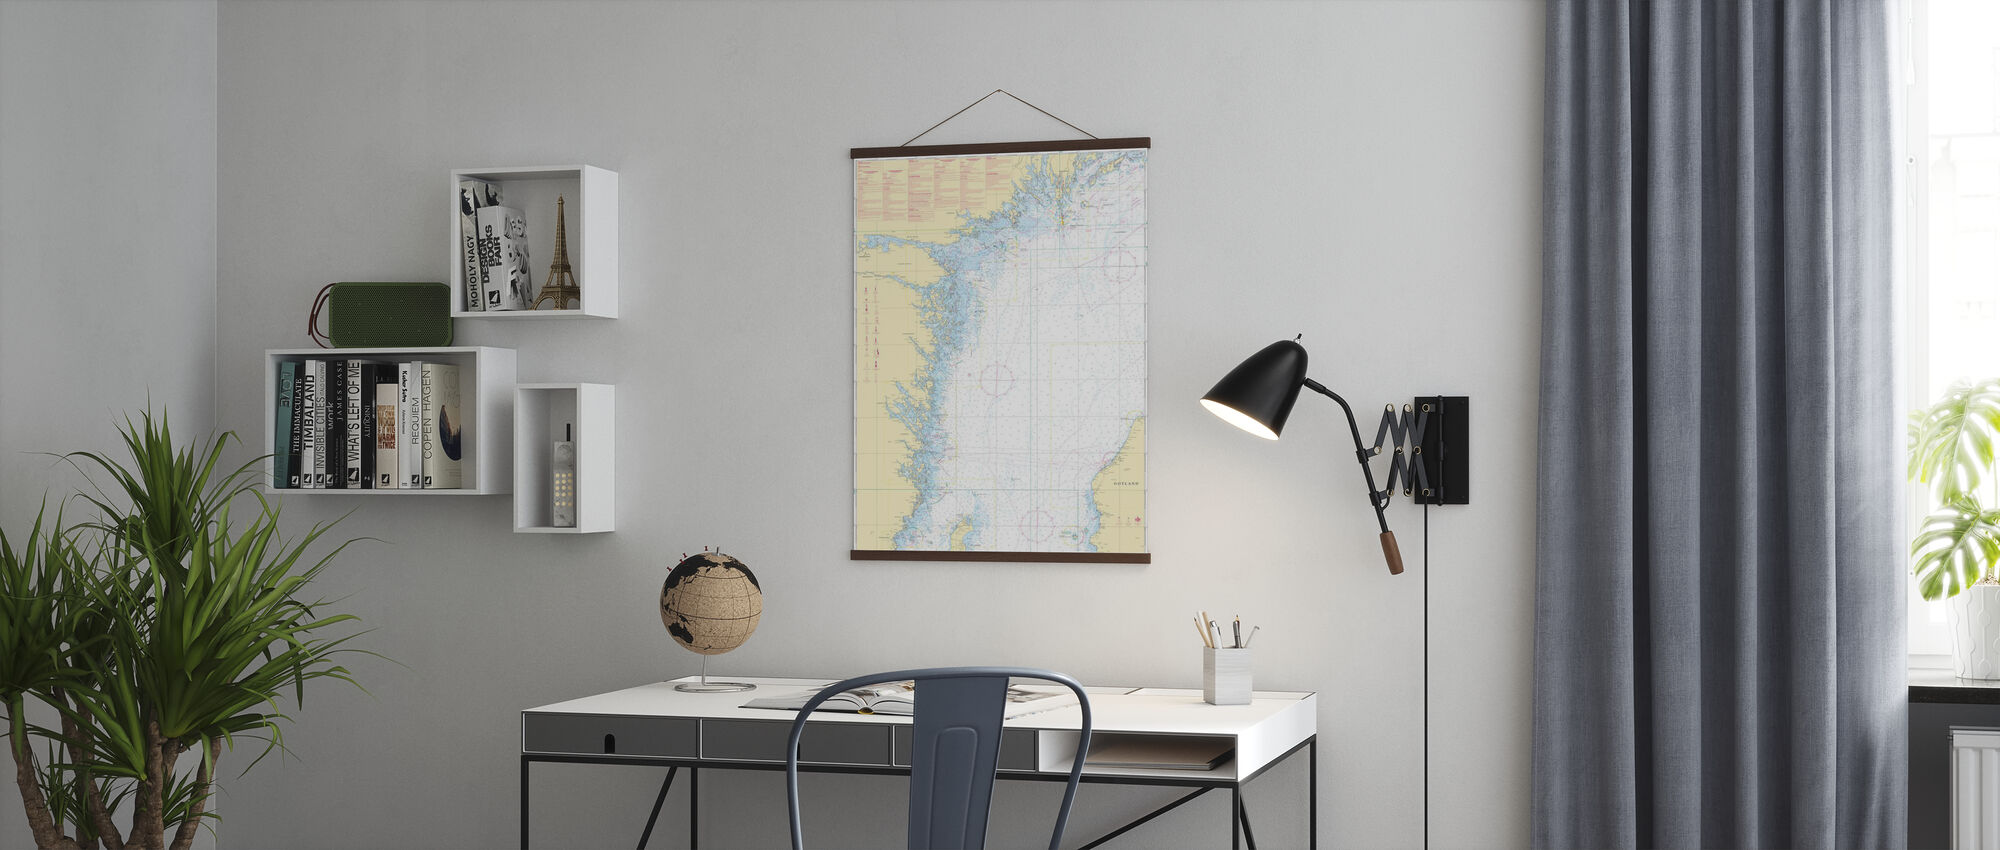 Sea Chart 72 - Oland - Landsort - Poster - Office